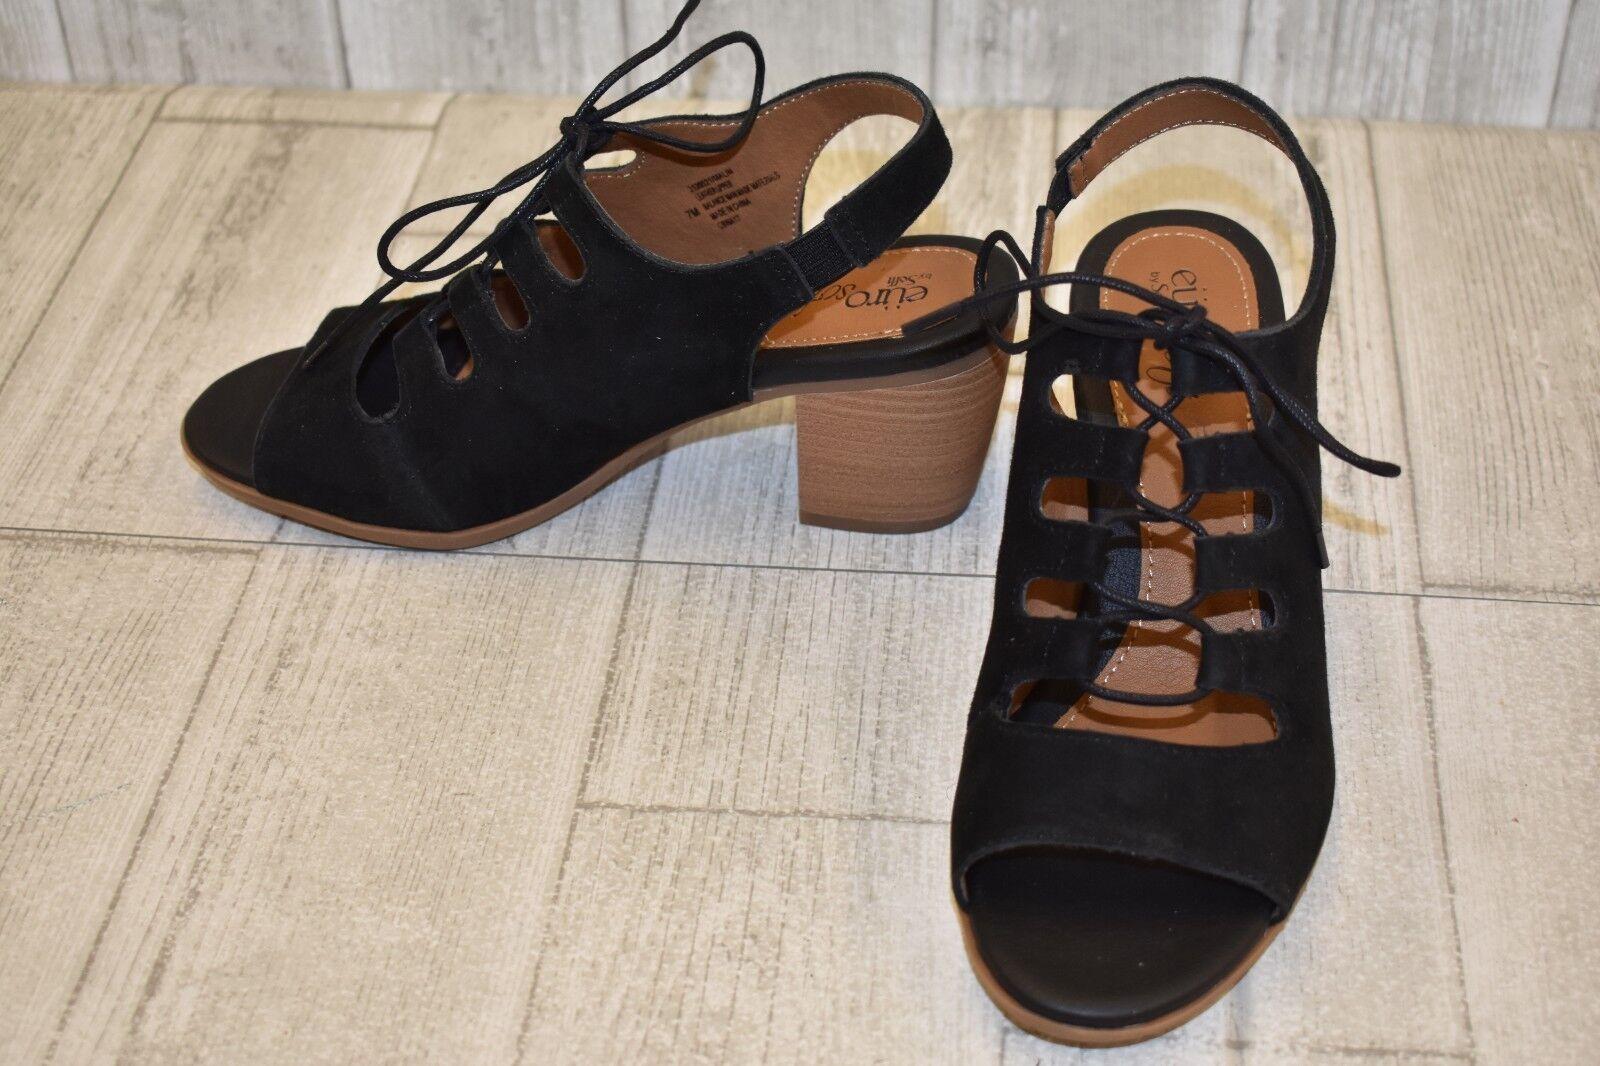 EuroSoft by Sofft Malin Heeled Sandal - Women's Size 7M - Black